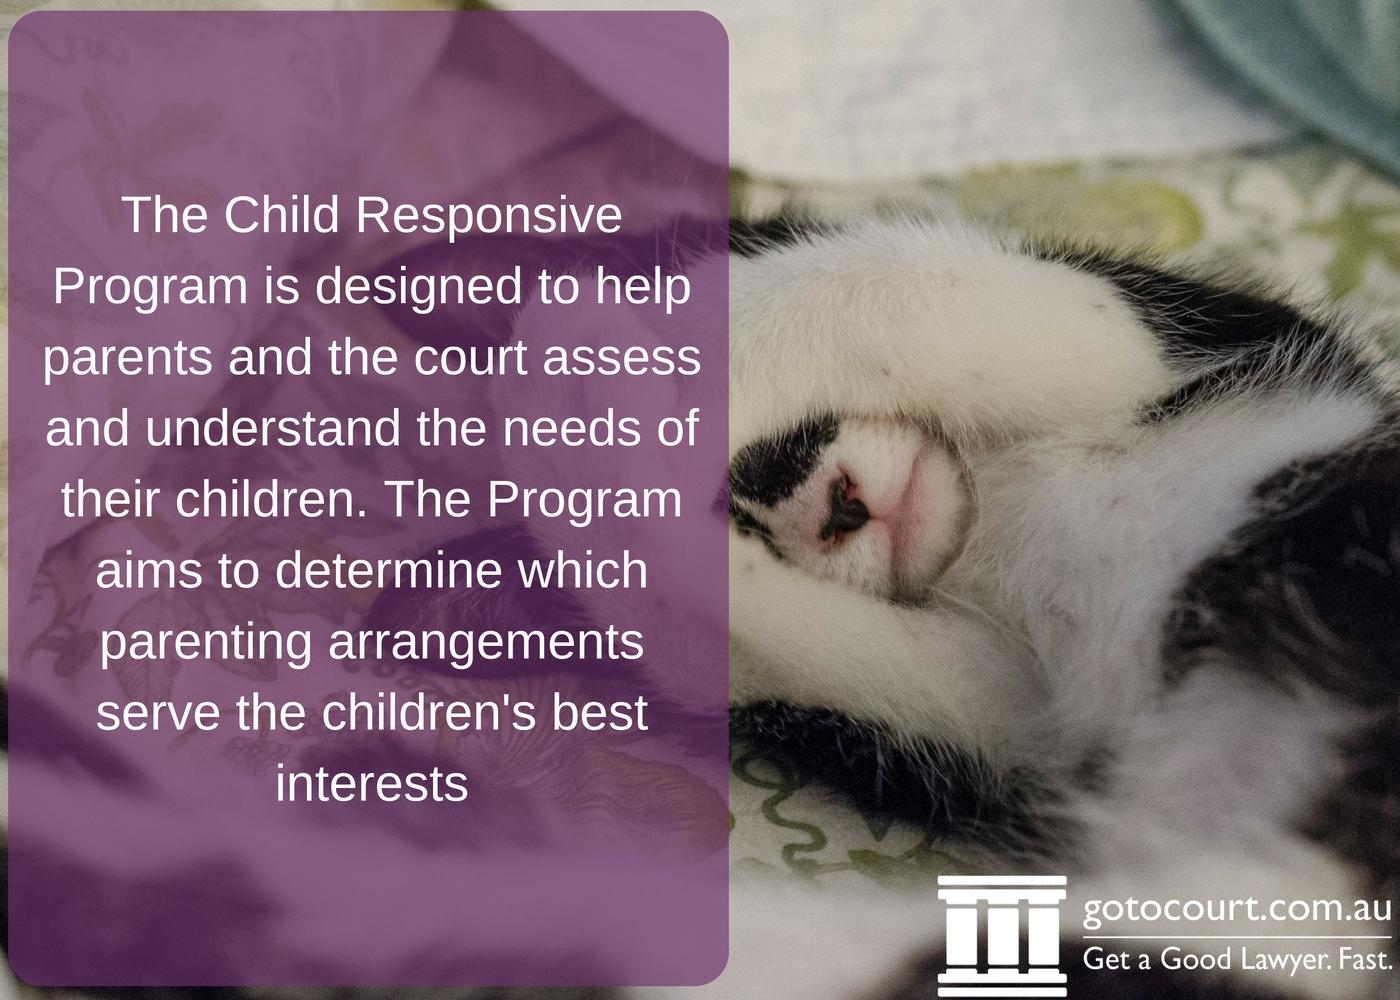 Child Responsive Program